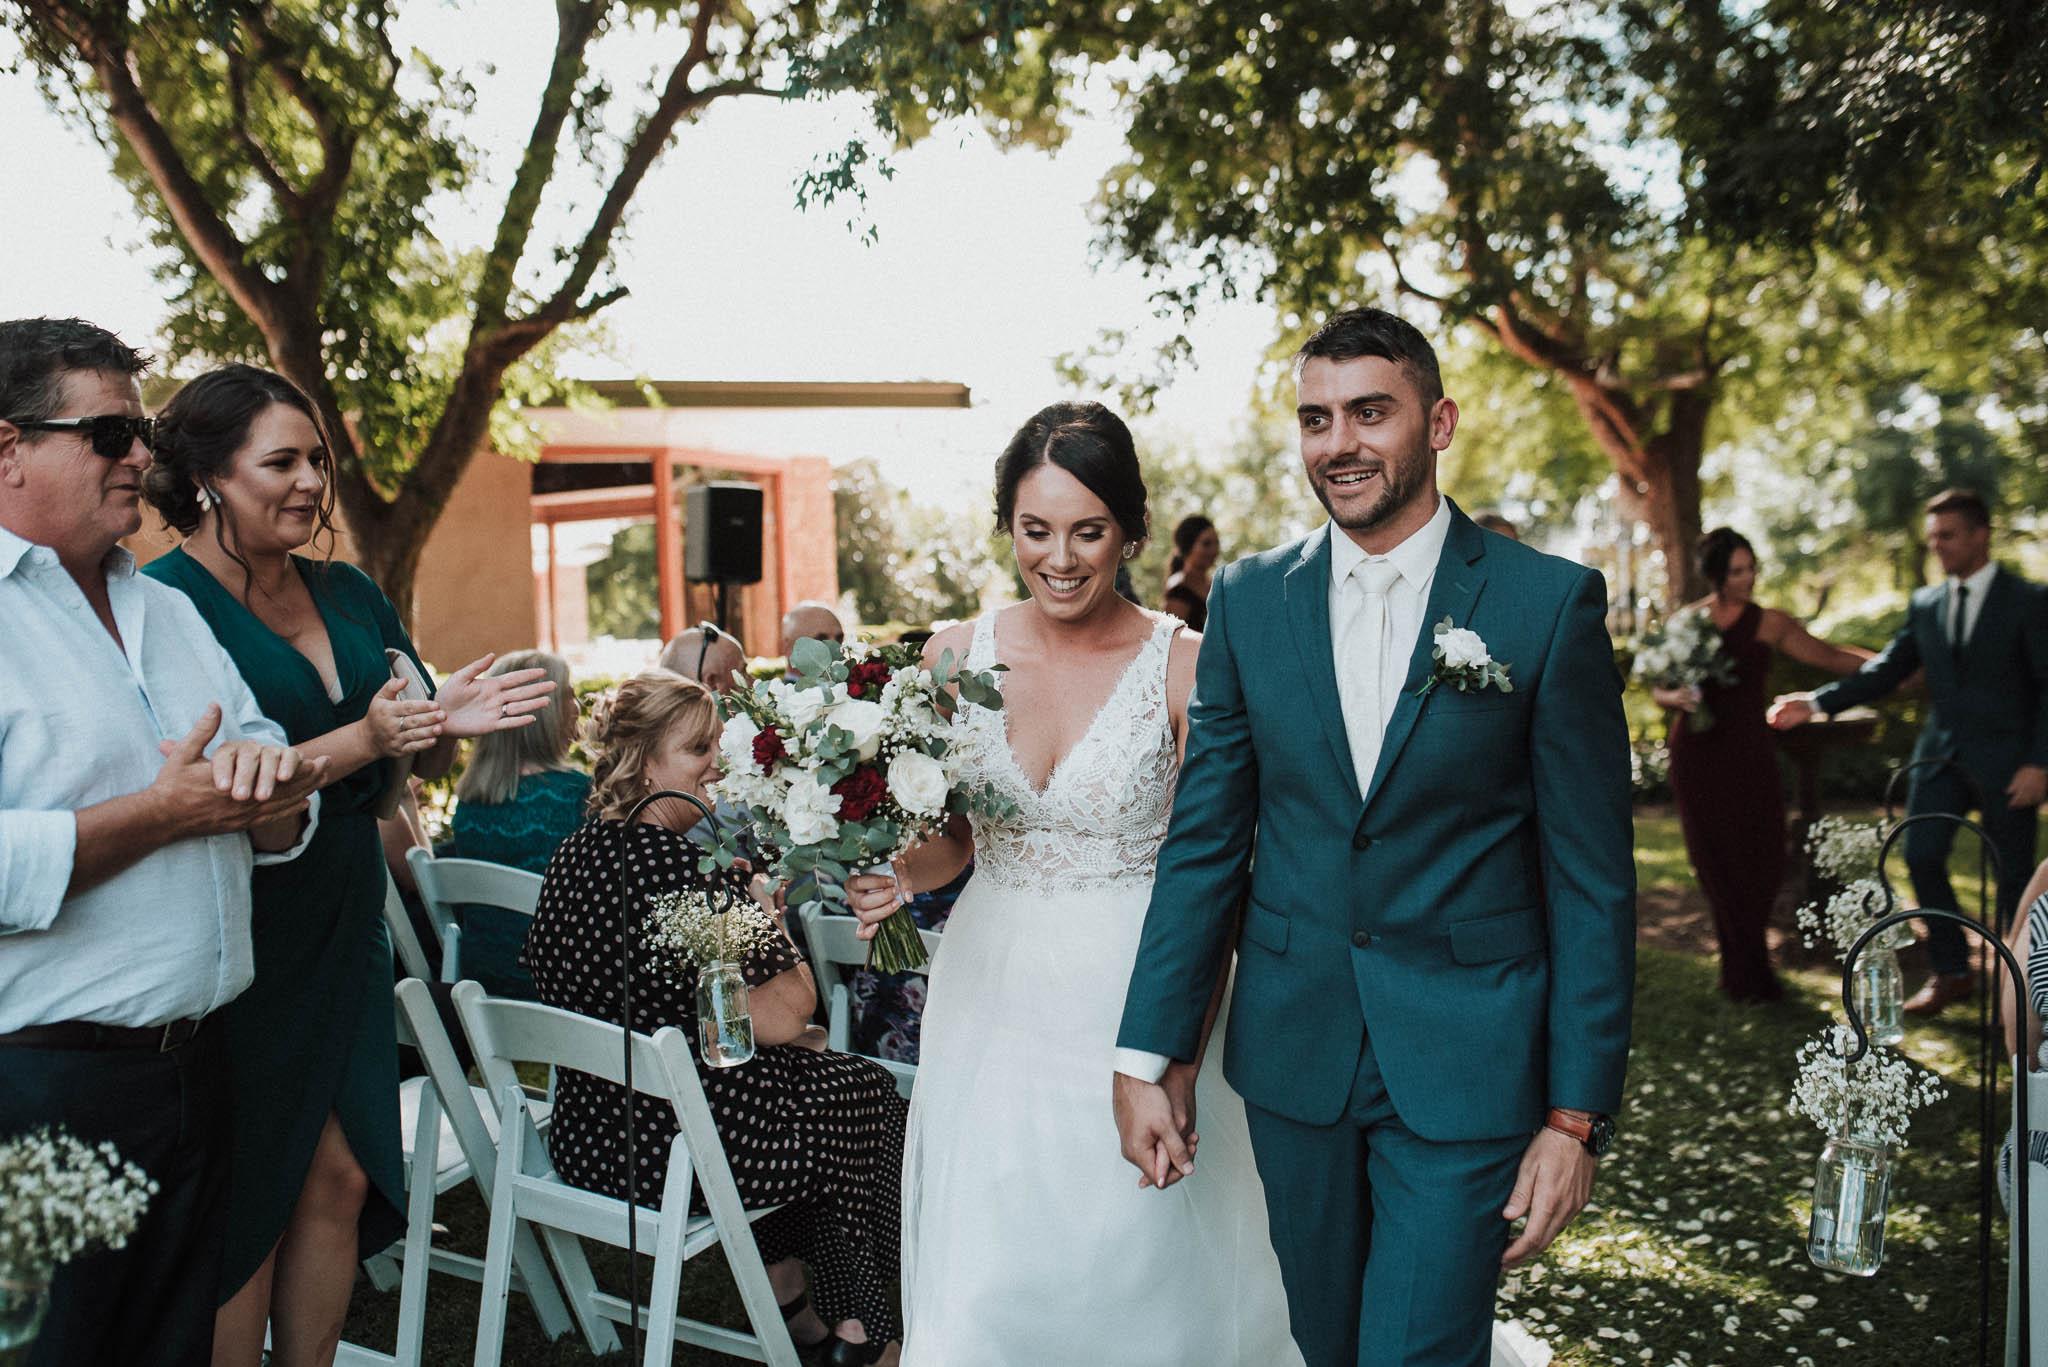 MECURE-RESORT-WEDDING-KING-WEB-105.jpg